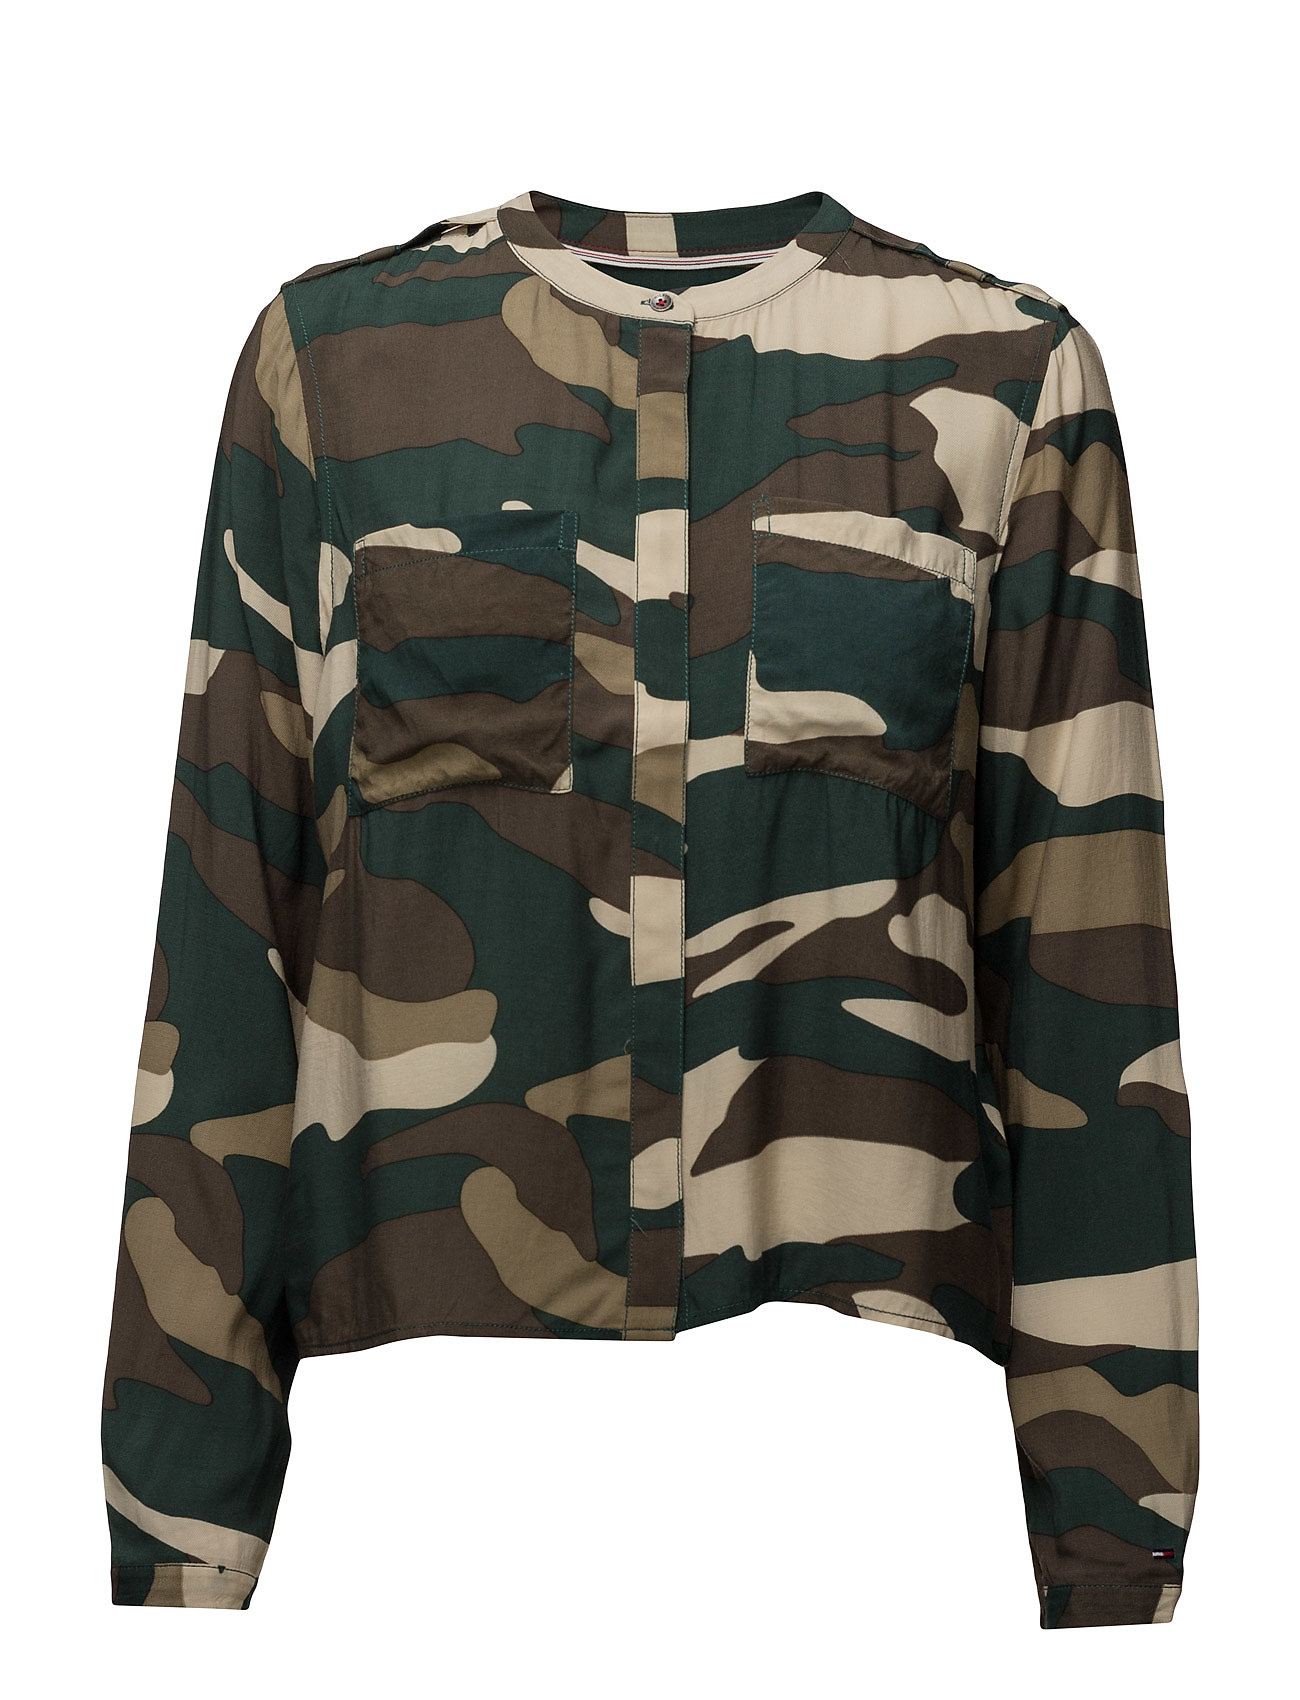 hilfiger denim – Thdw utility shirt l/s 43 fra boozt.com dk